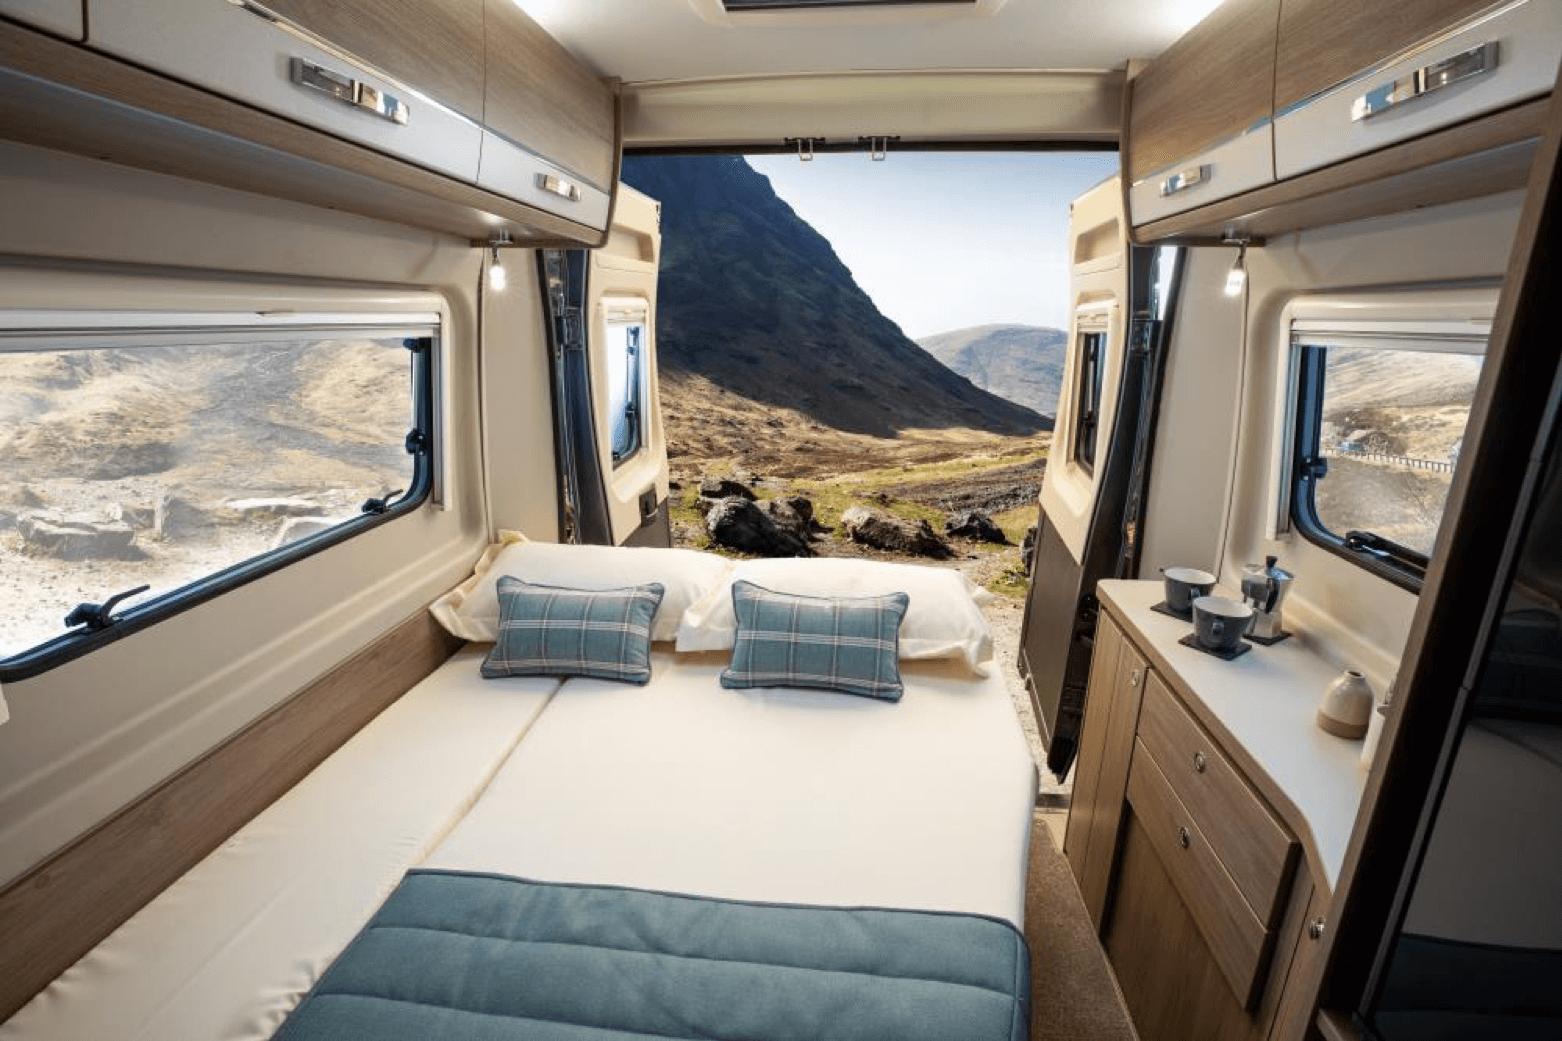 2020 new Compass Avantgarde CV60